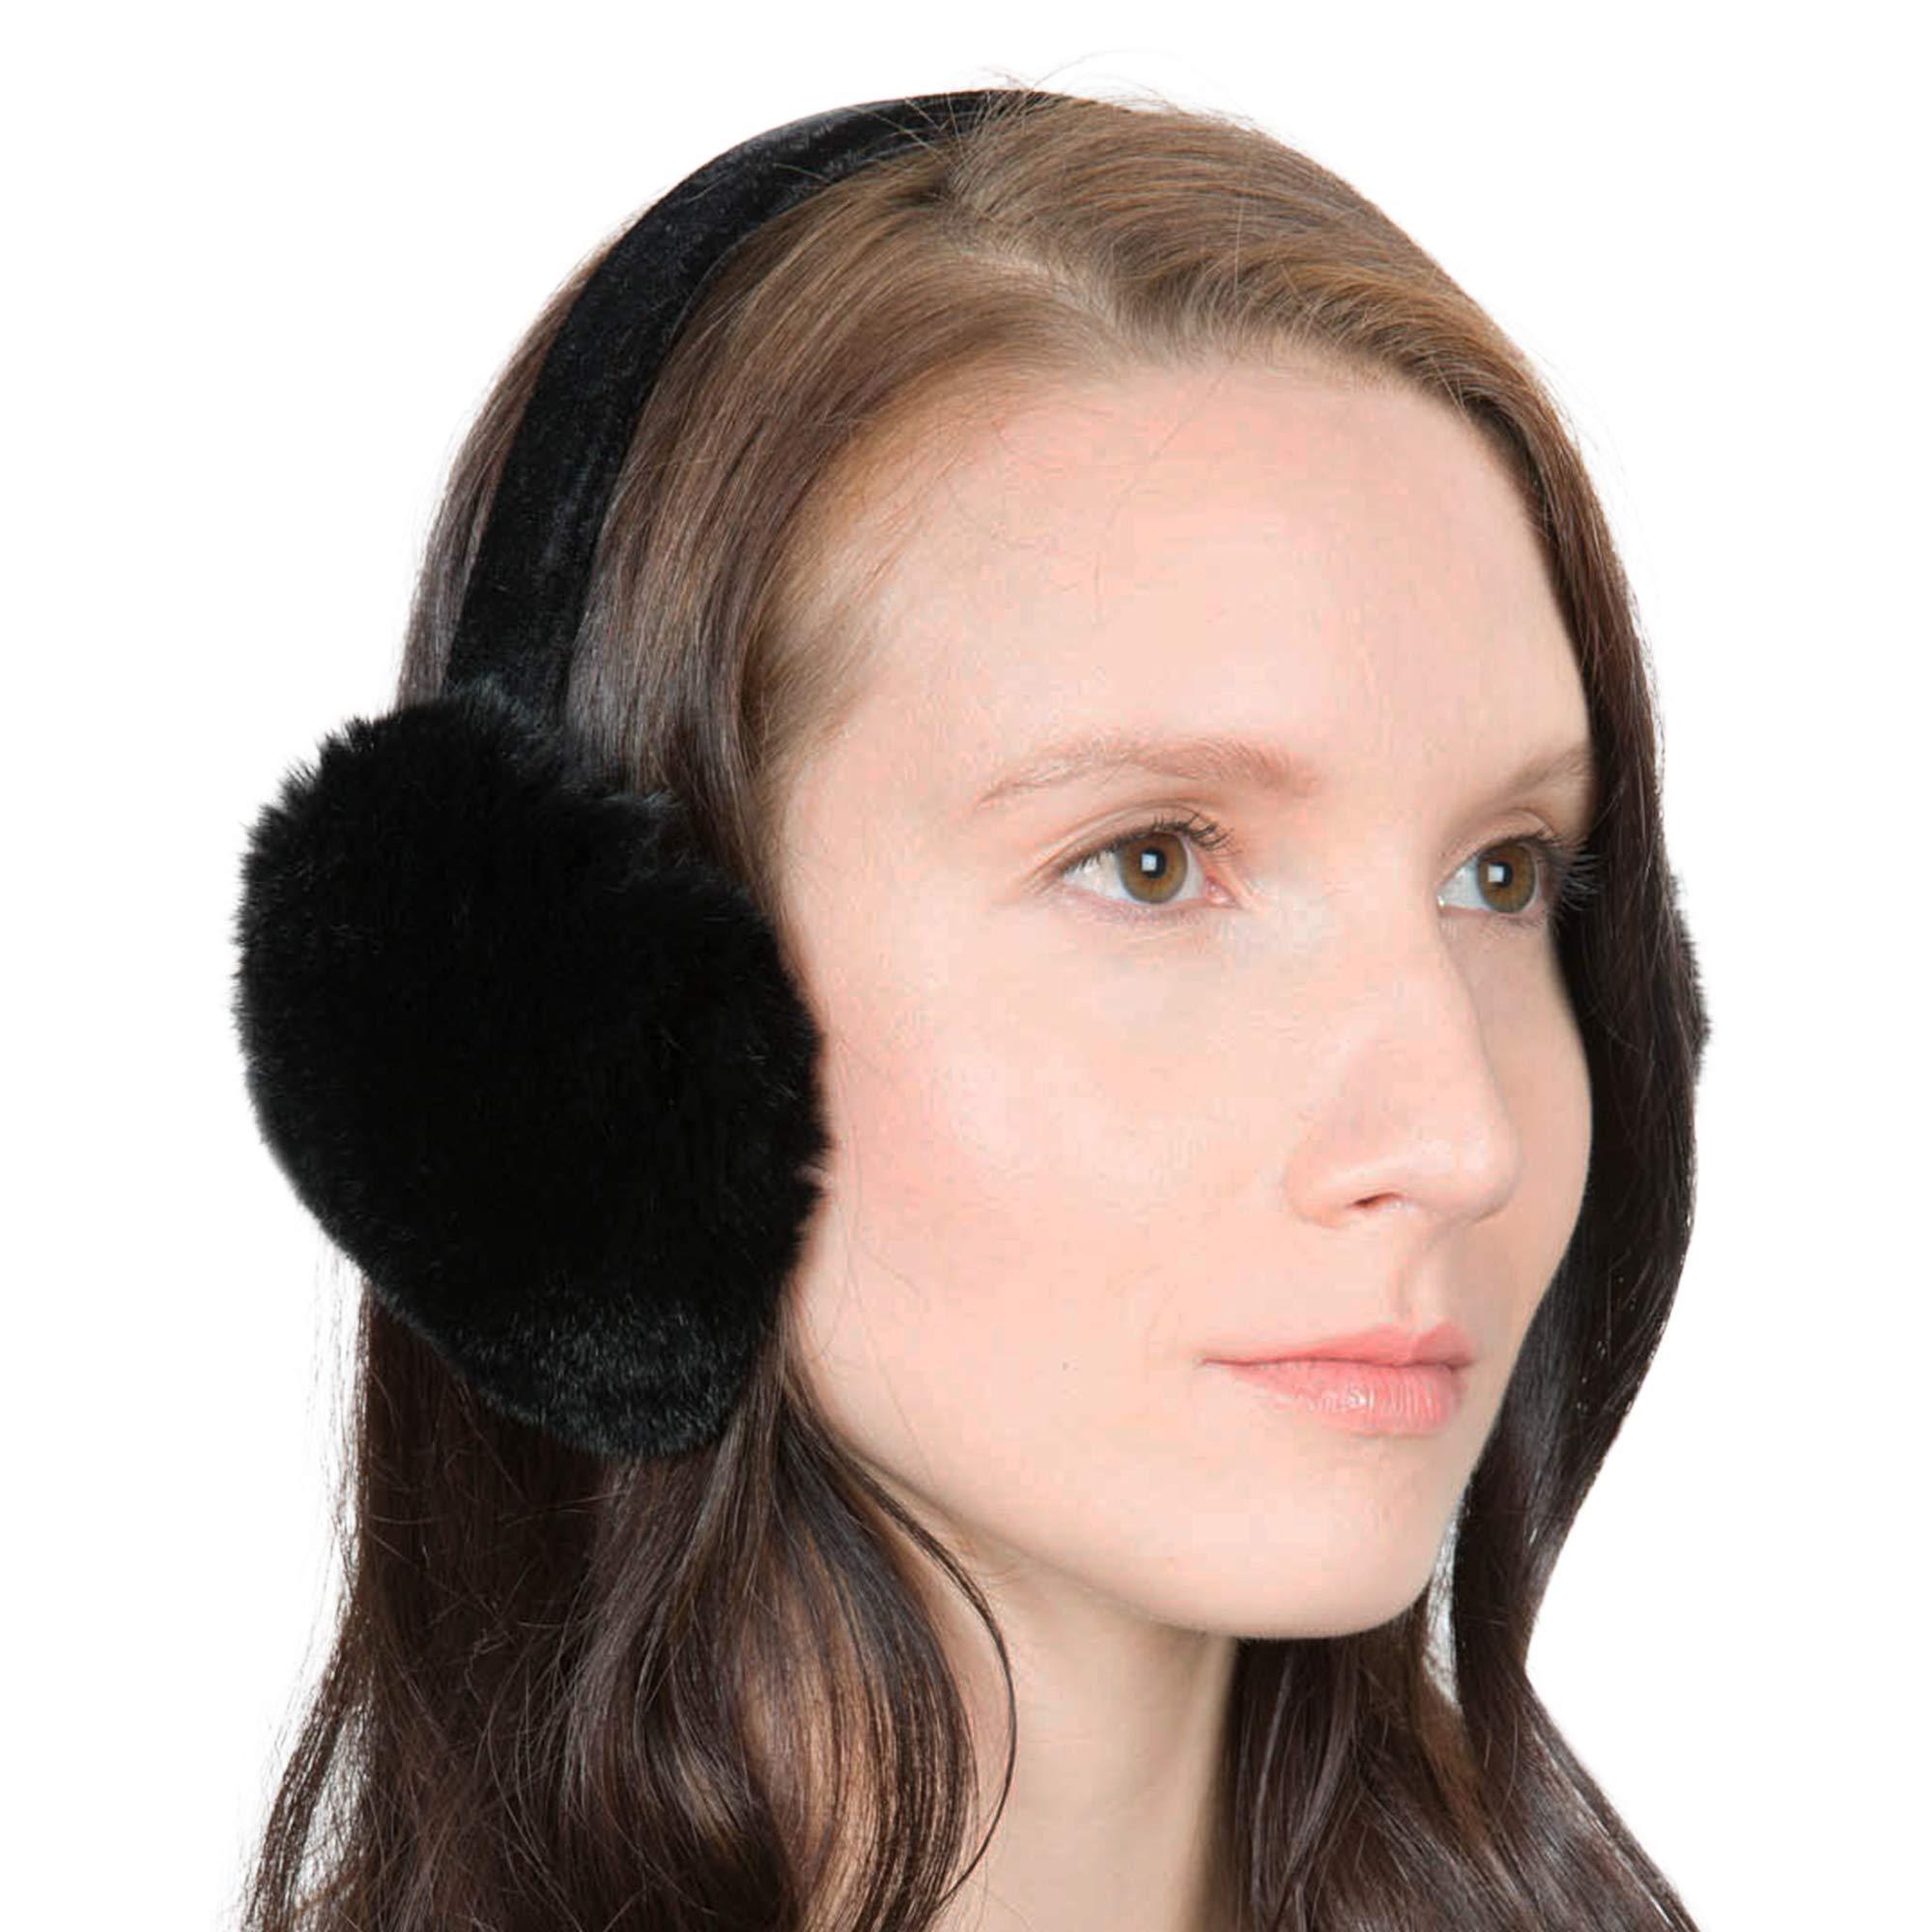 OBURLA Fur Earmuffs | Luxurious Real Fur Over Ear Warmers with Headband (Rex Rabbit Fur, Black)